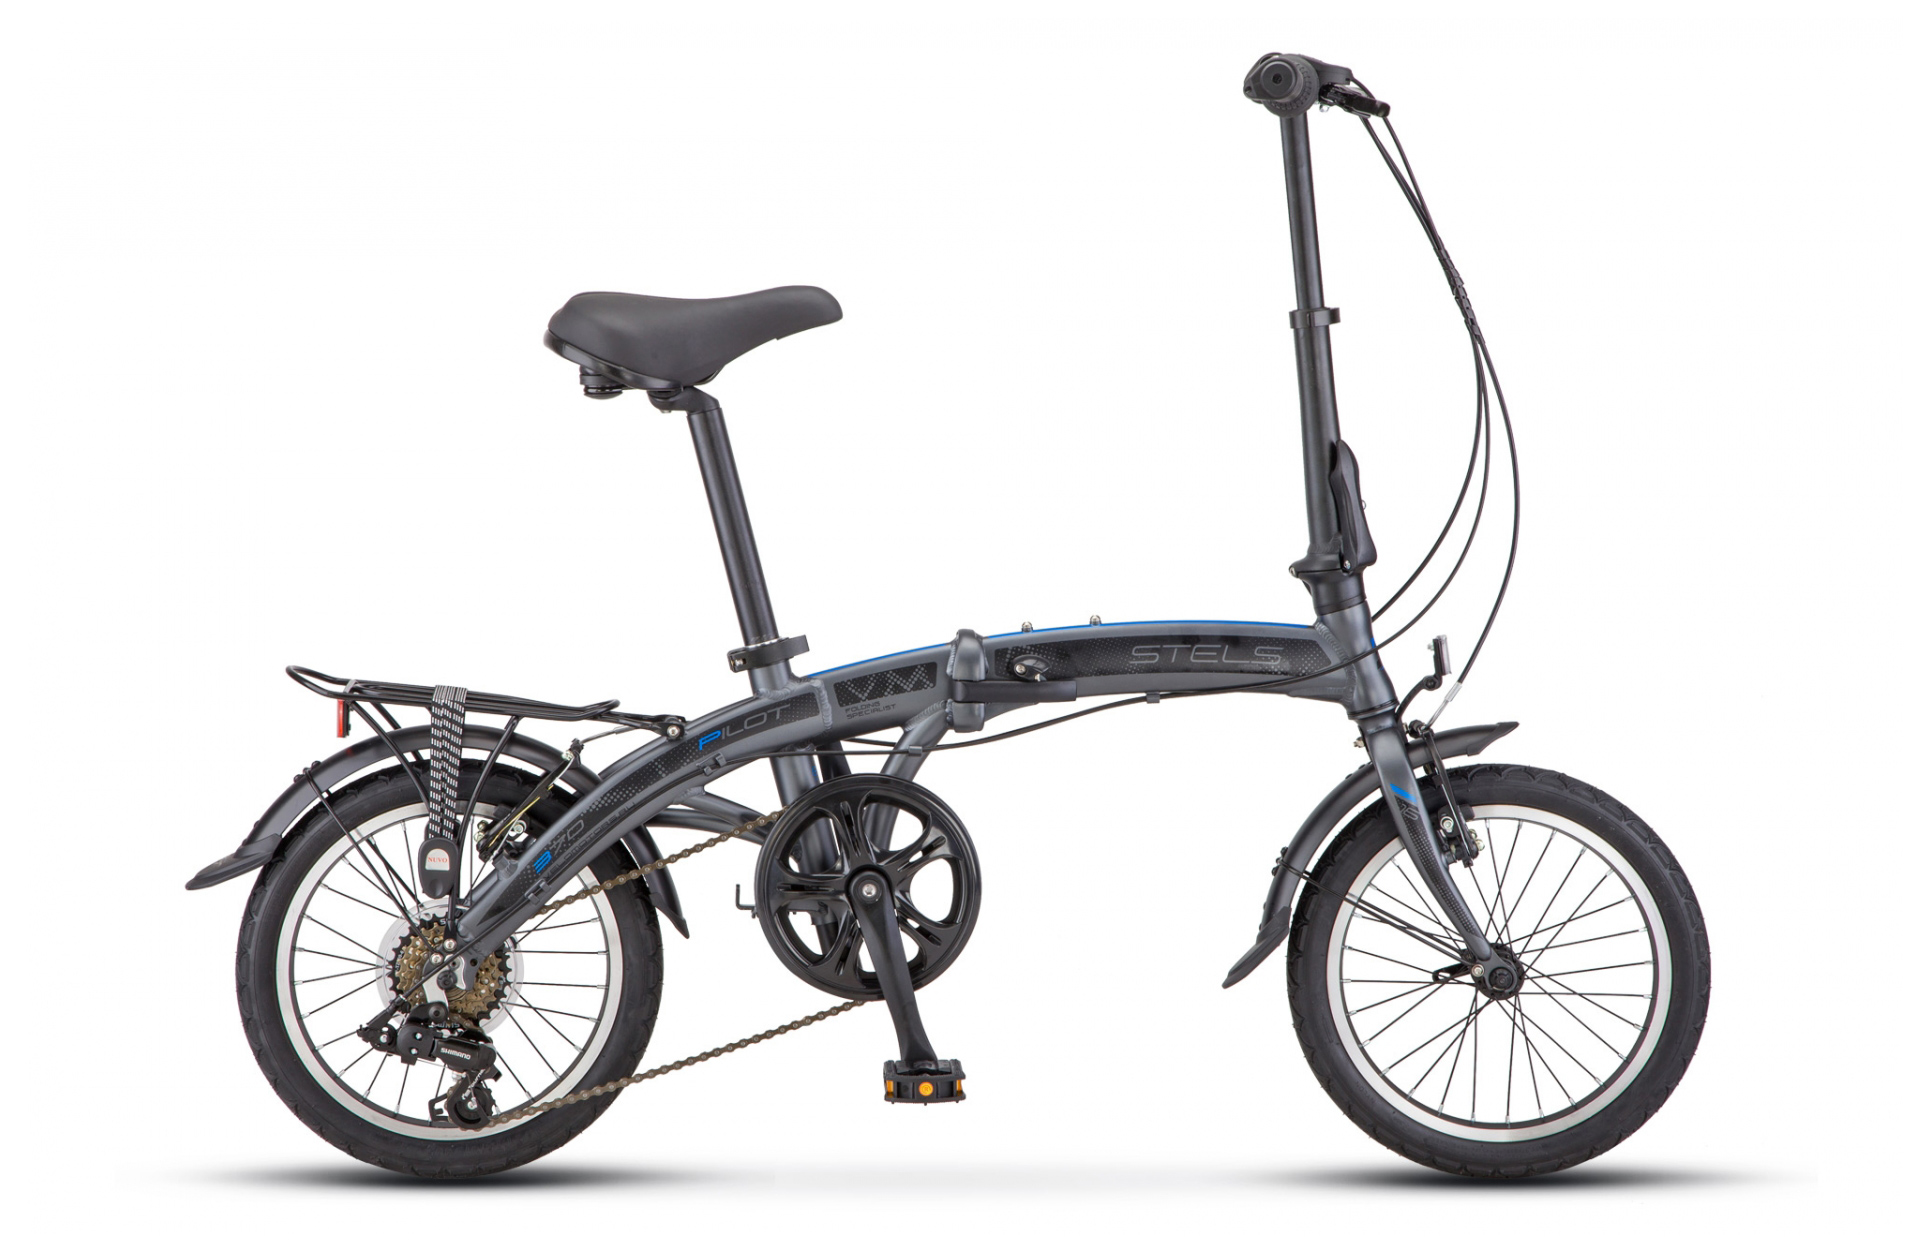 Велосипед Stels Pilot 370 16 (V010) 2019 велосипед stels pilot 750 2016